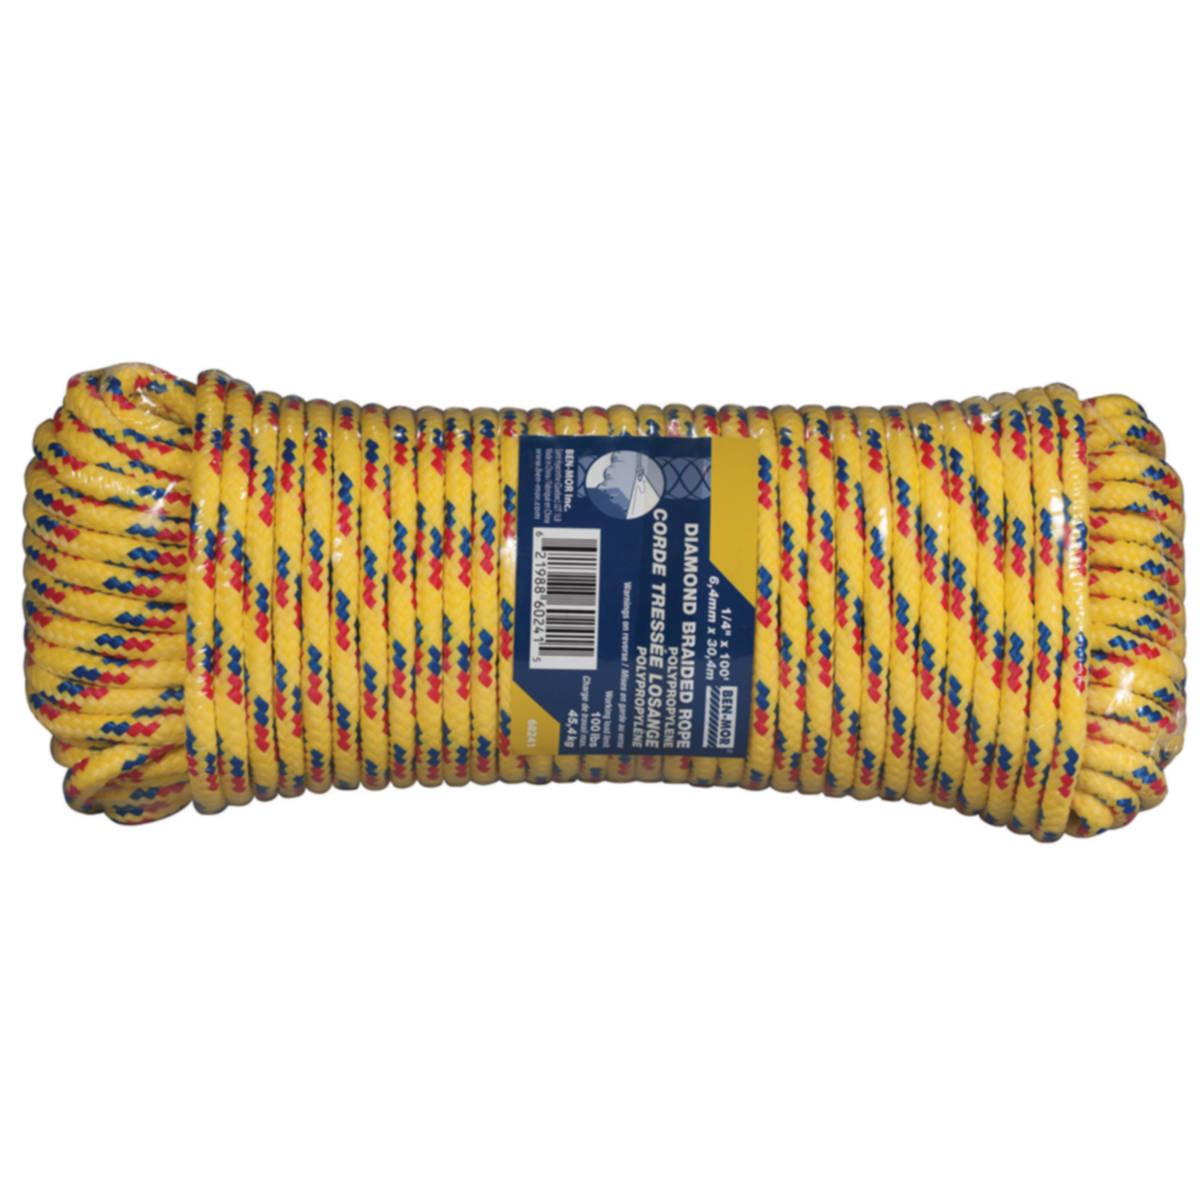 Ben-Mor Cables 60241